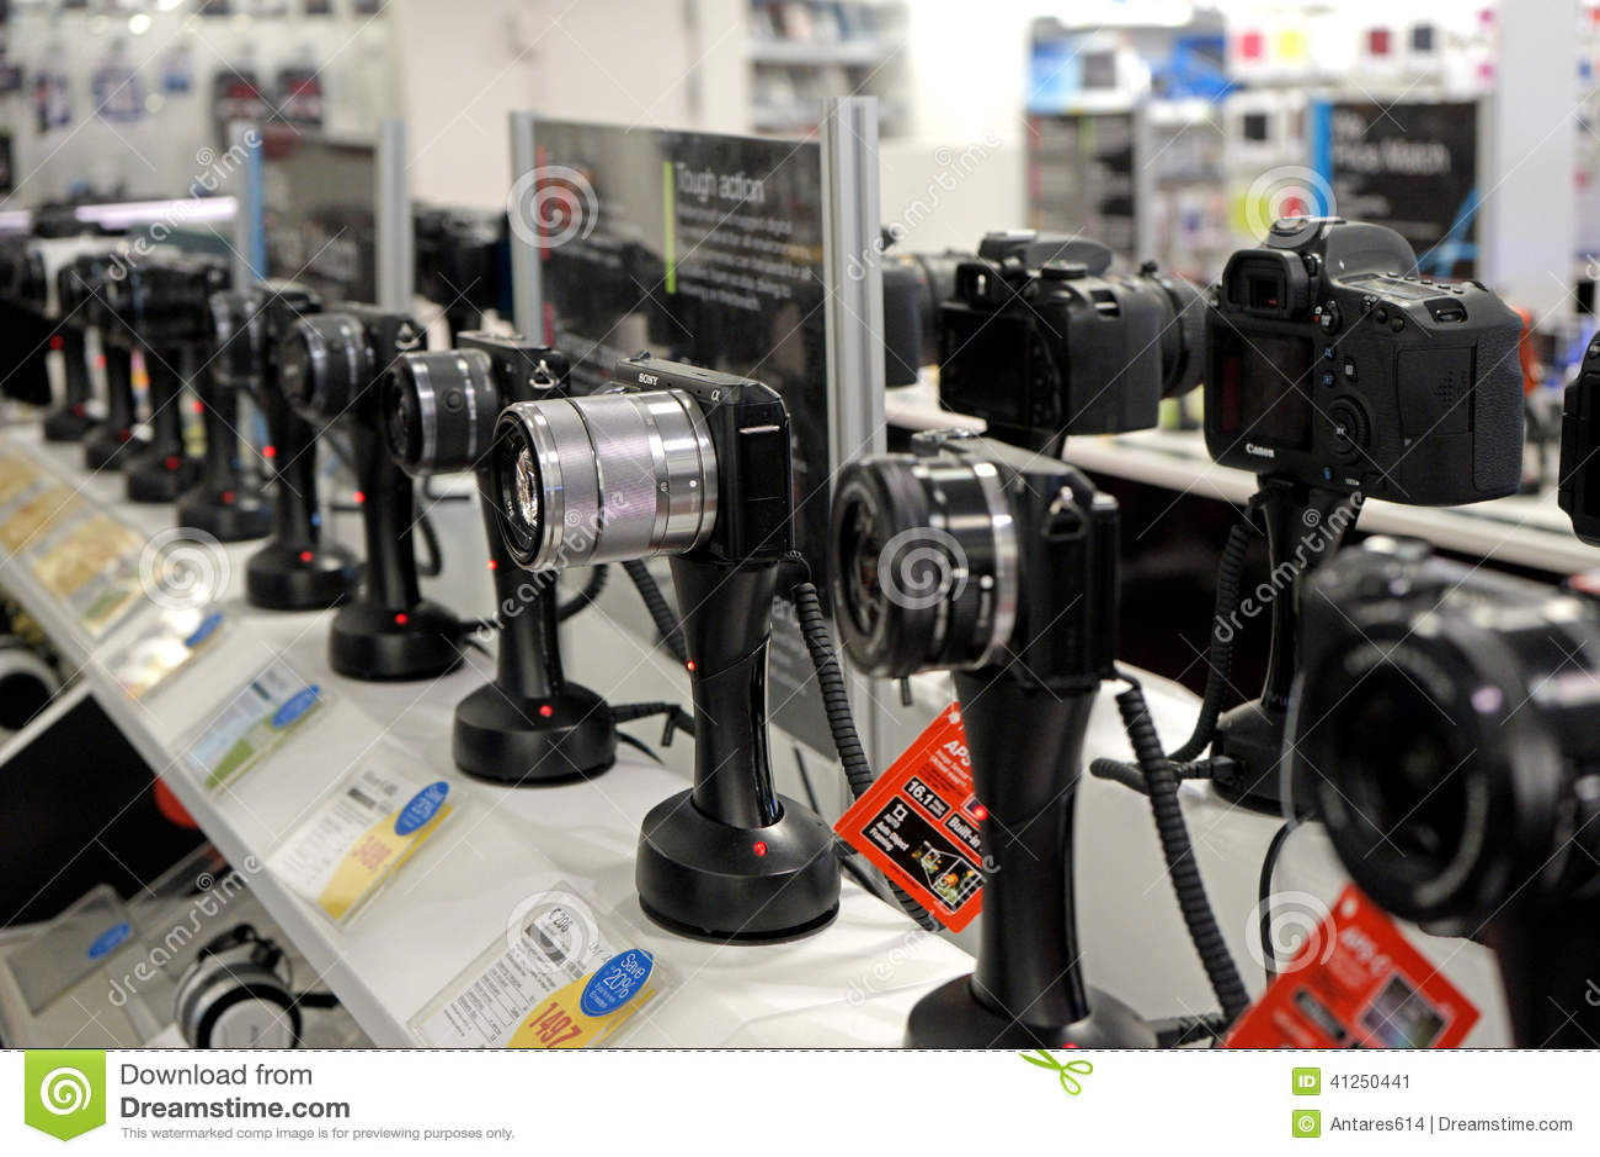 Photo Camera Store Editorial Photo - Image: 41250441